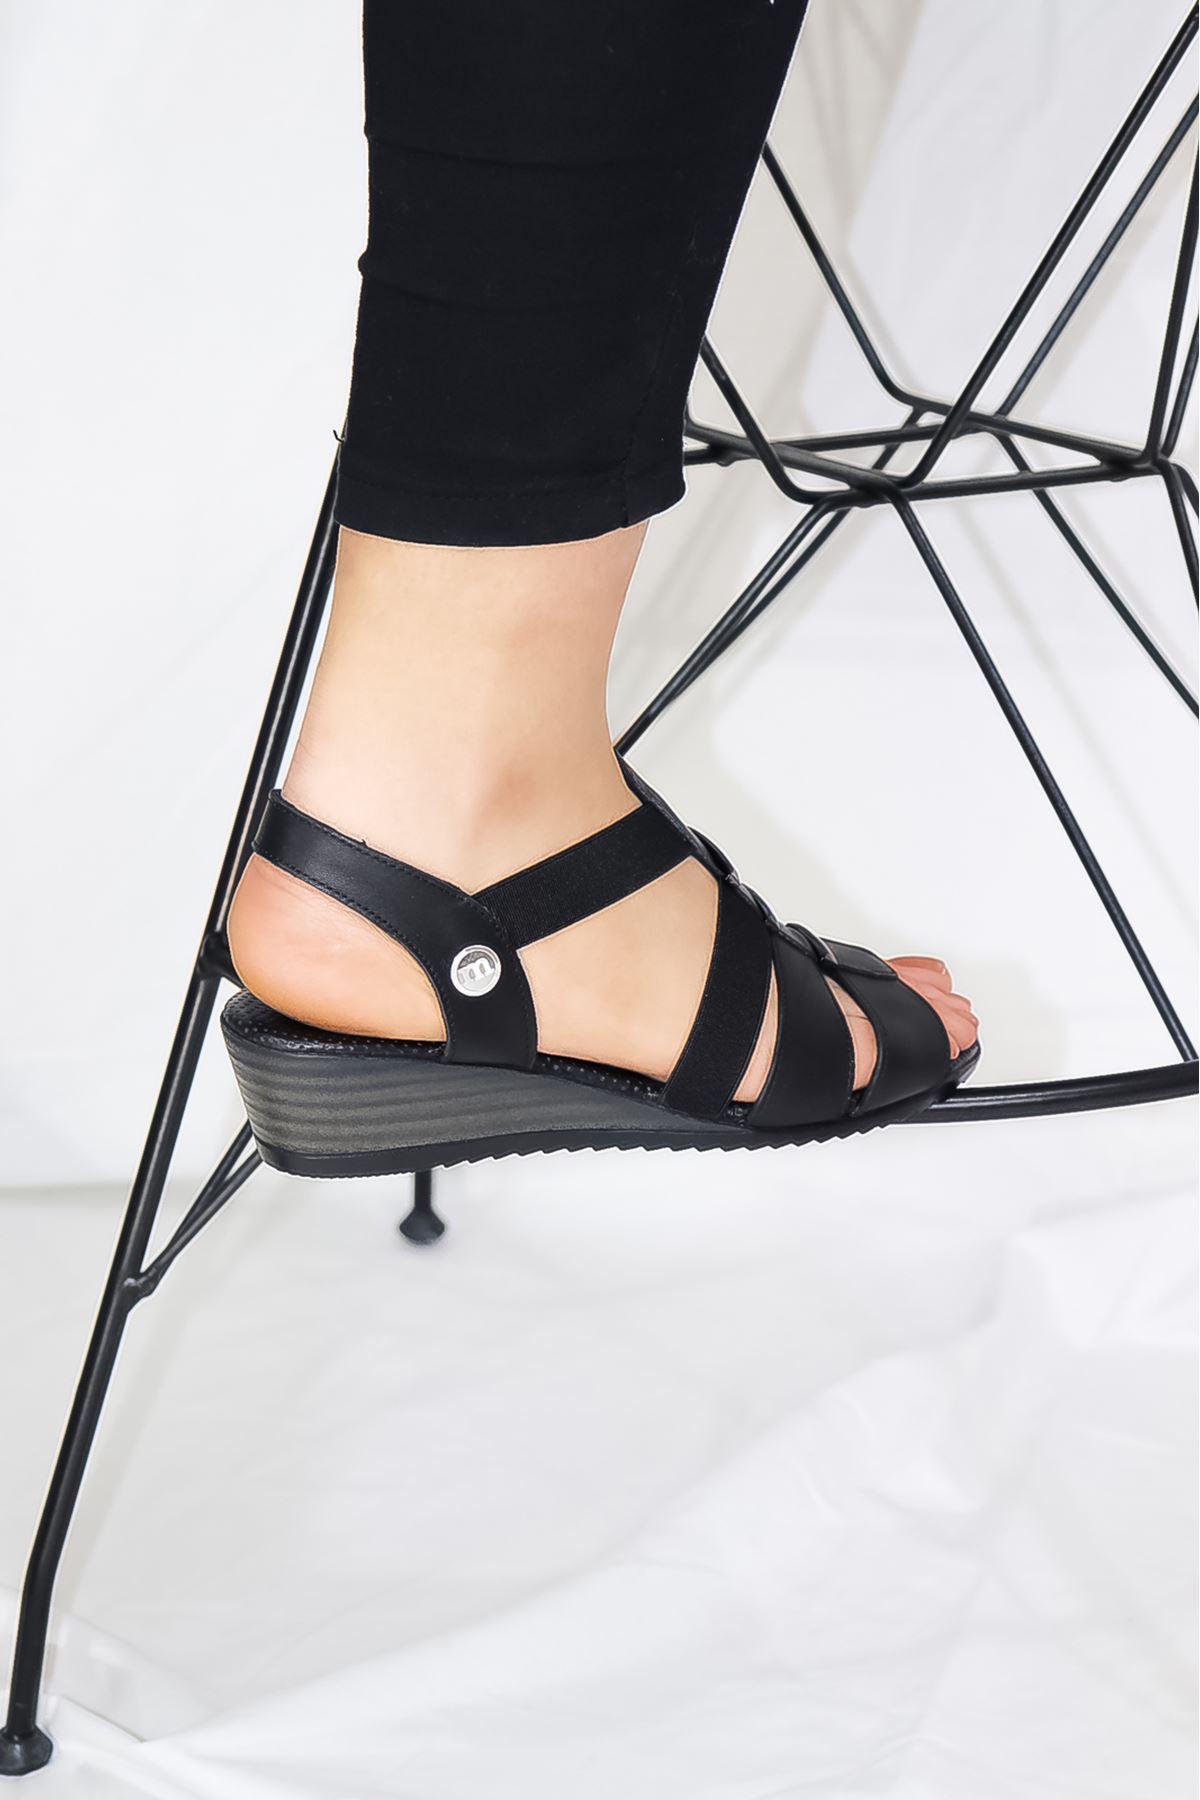 Mammamia - D21YS - 1045-B Siyah Ortopedik Kadın Sandaleti